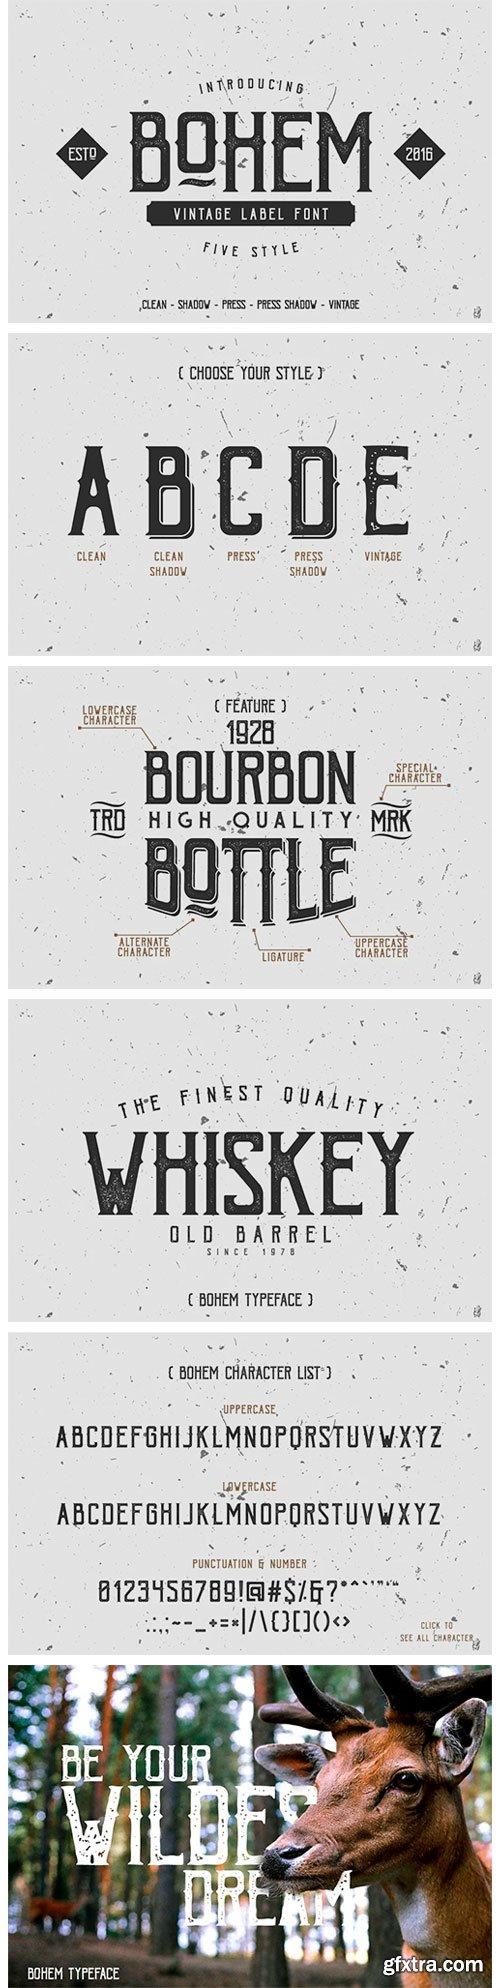 Bohem Typeface